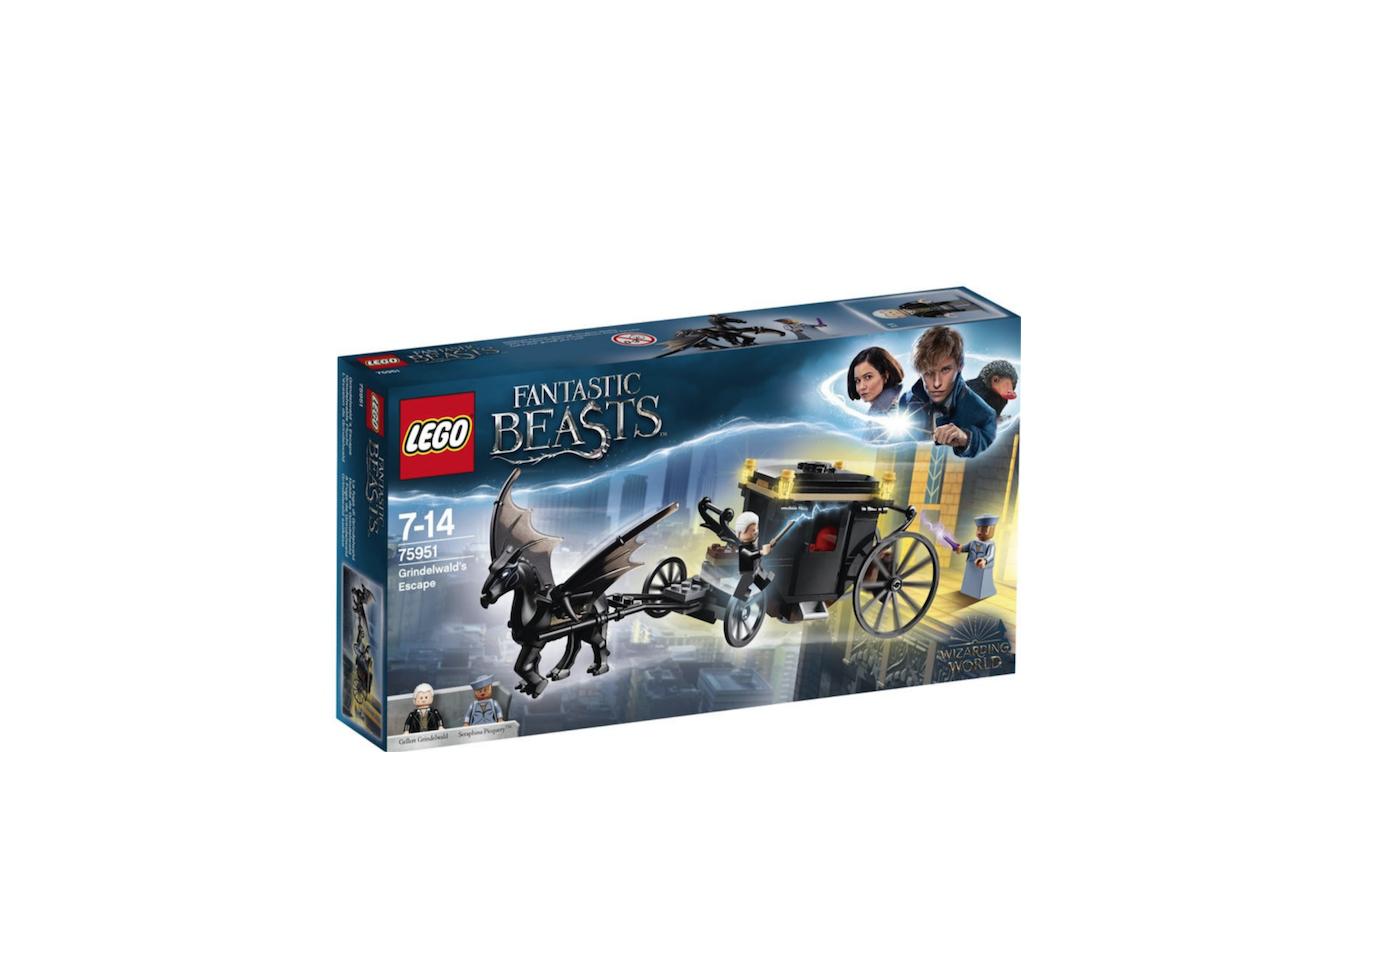 LEGO FANTASTIC BEASTS 75951 RARE COLLECTOR JOUET JEU JEUX ITEM 6212636 CONSTRUCTION ENFANT NOEL NEUF 5702016110340 COMASOUND KARTEL